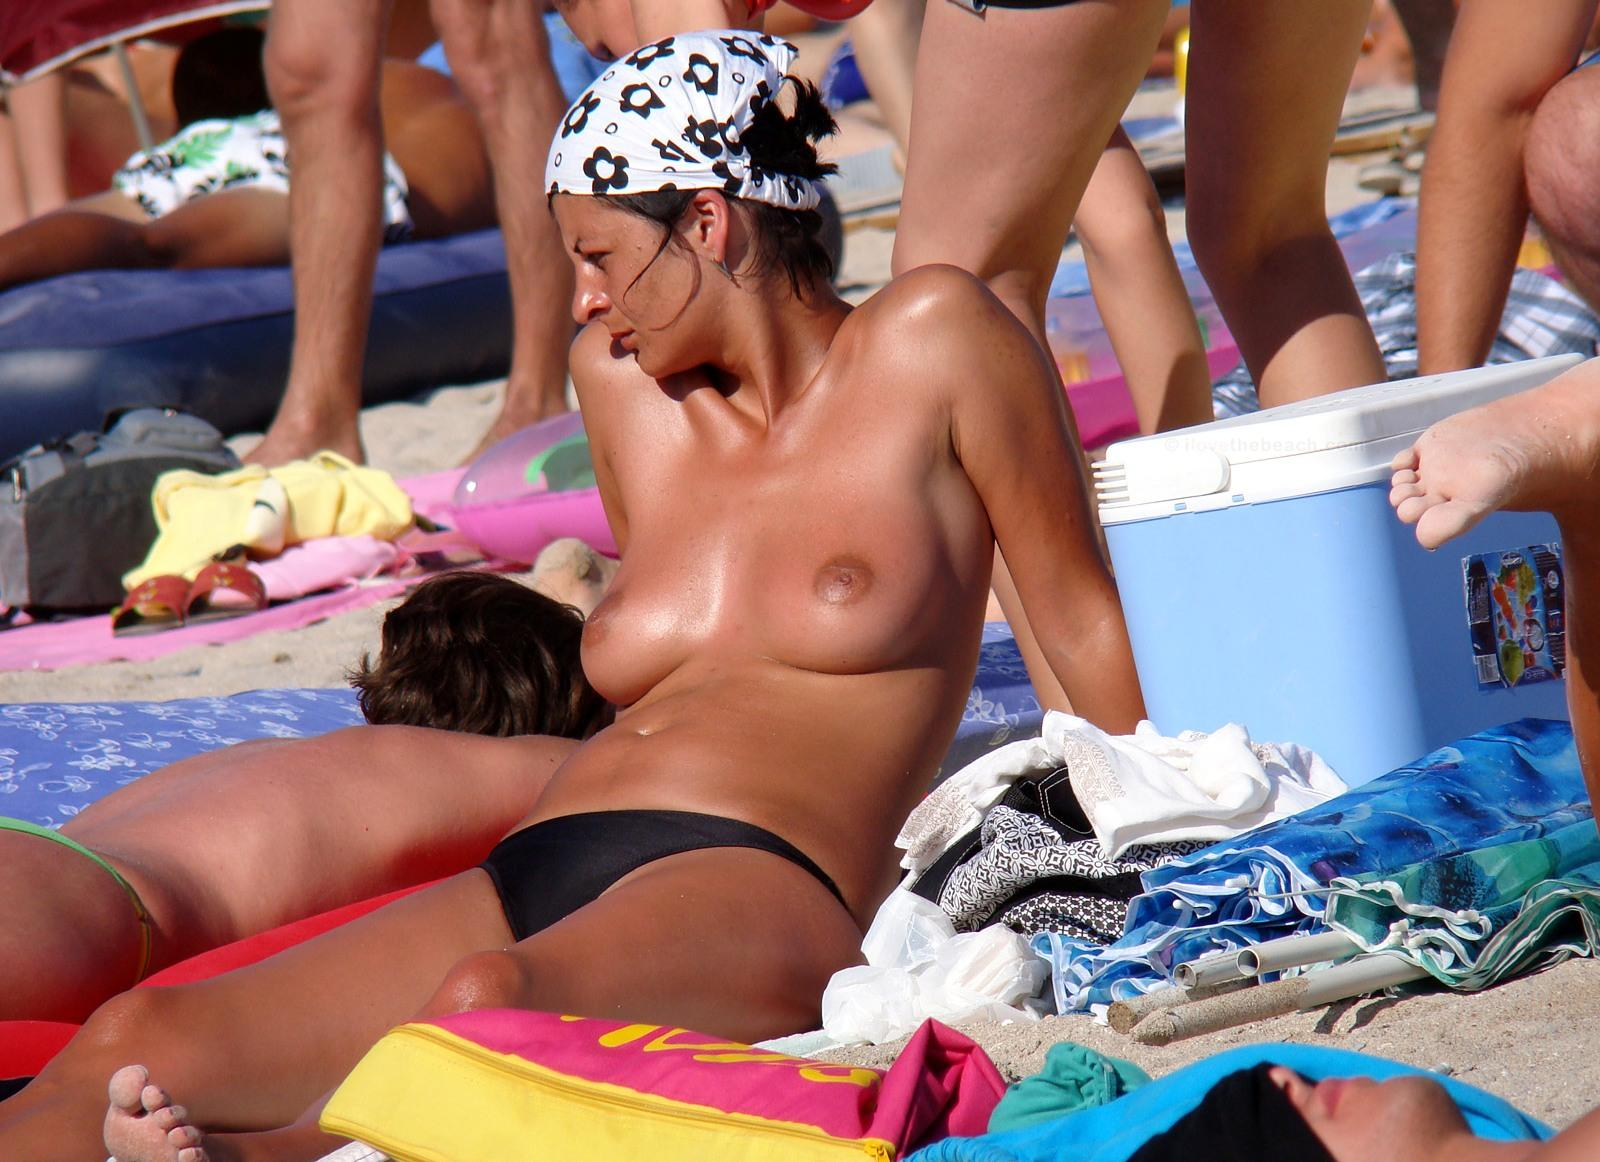 Britain's best nudist or naturist beaches